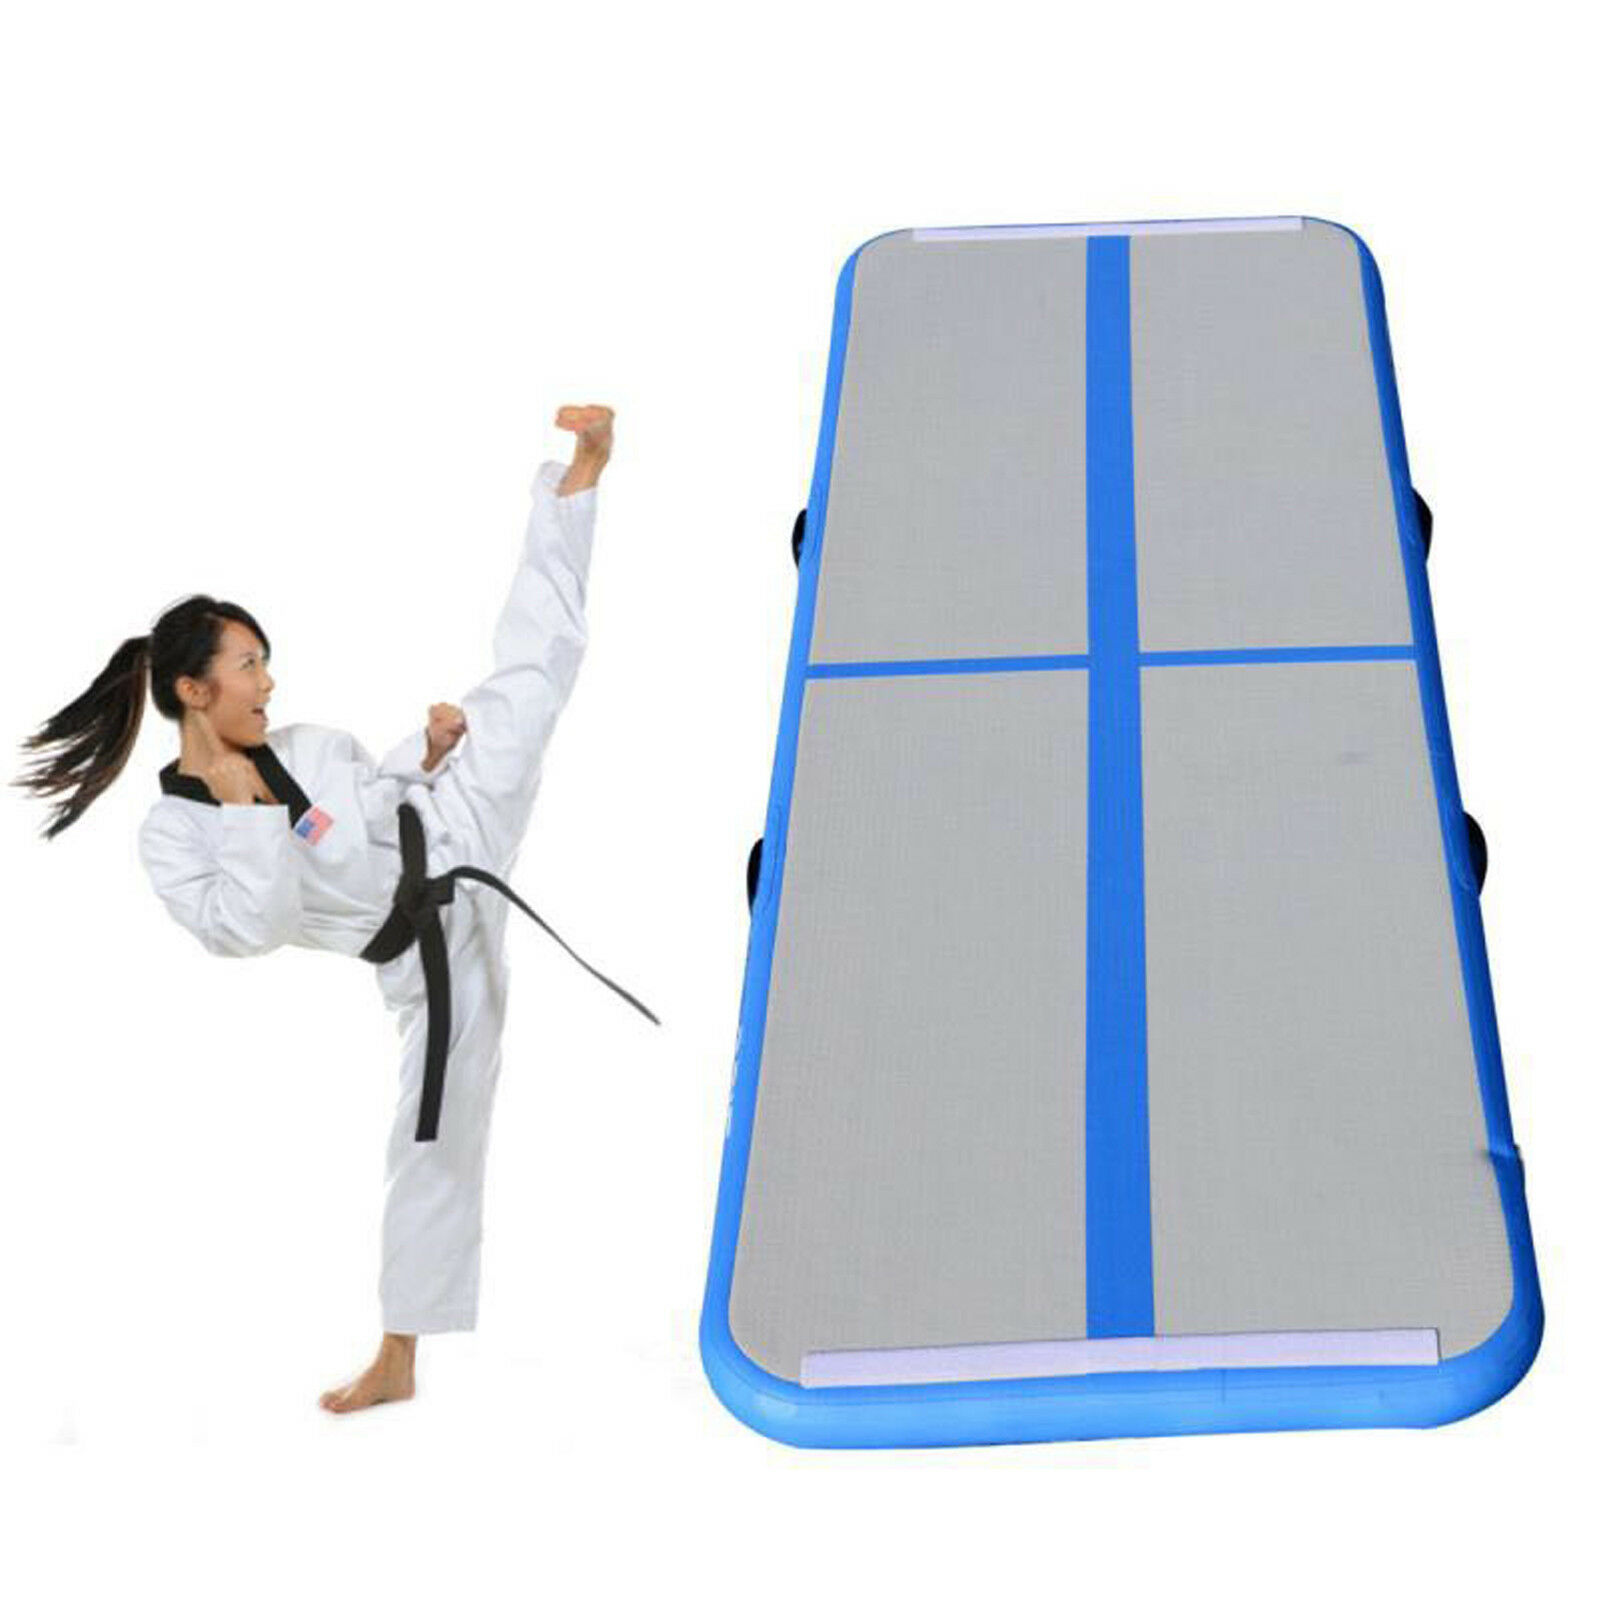 mats used gymnastics incline com purple wedge